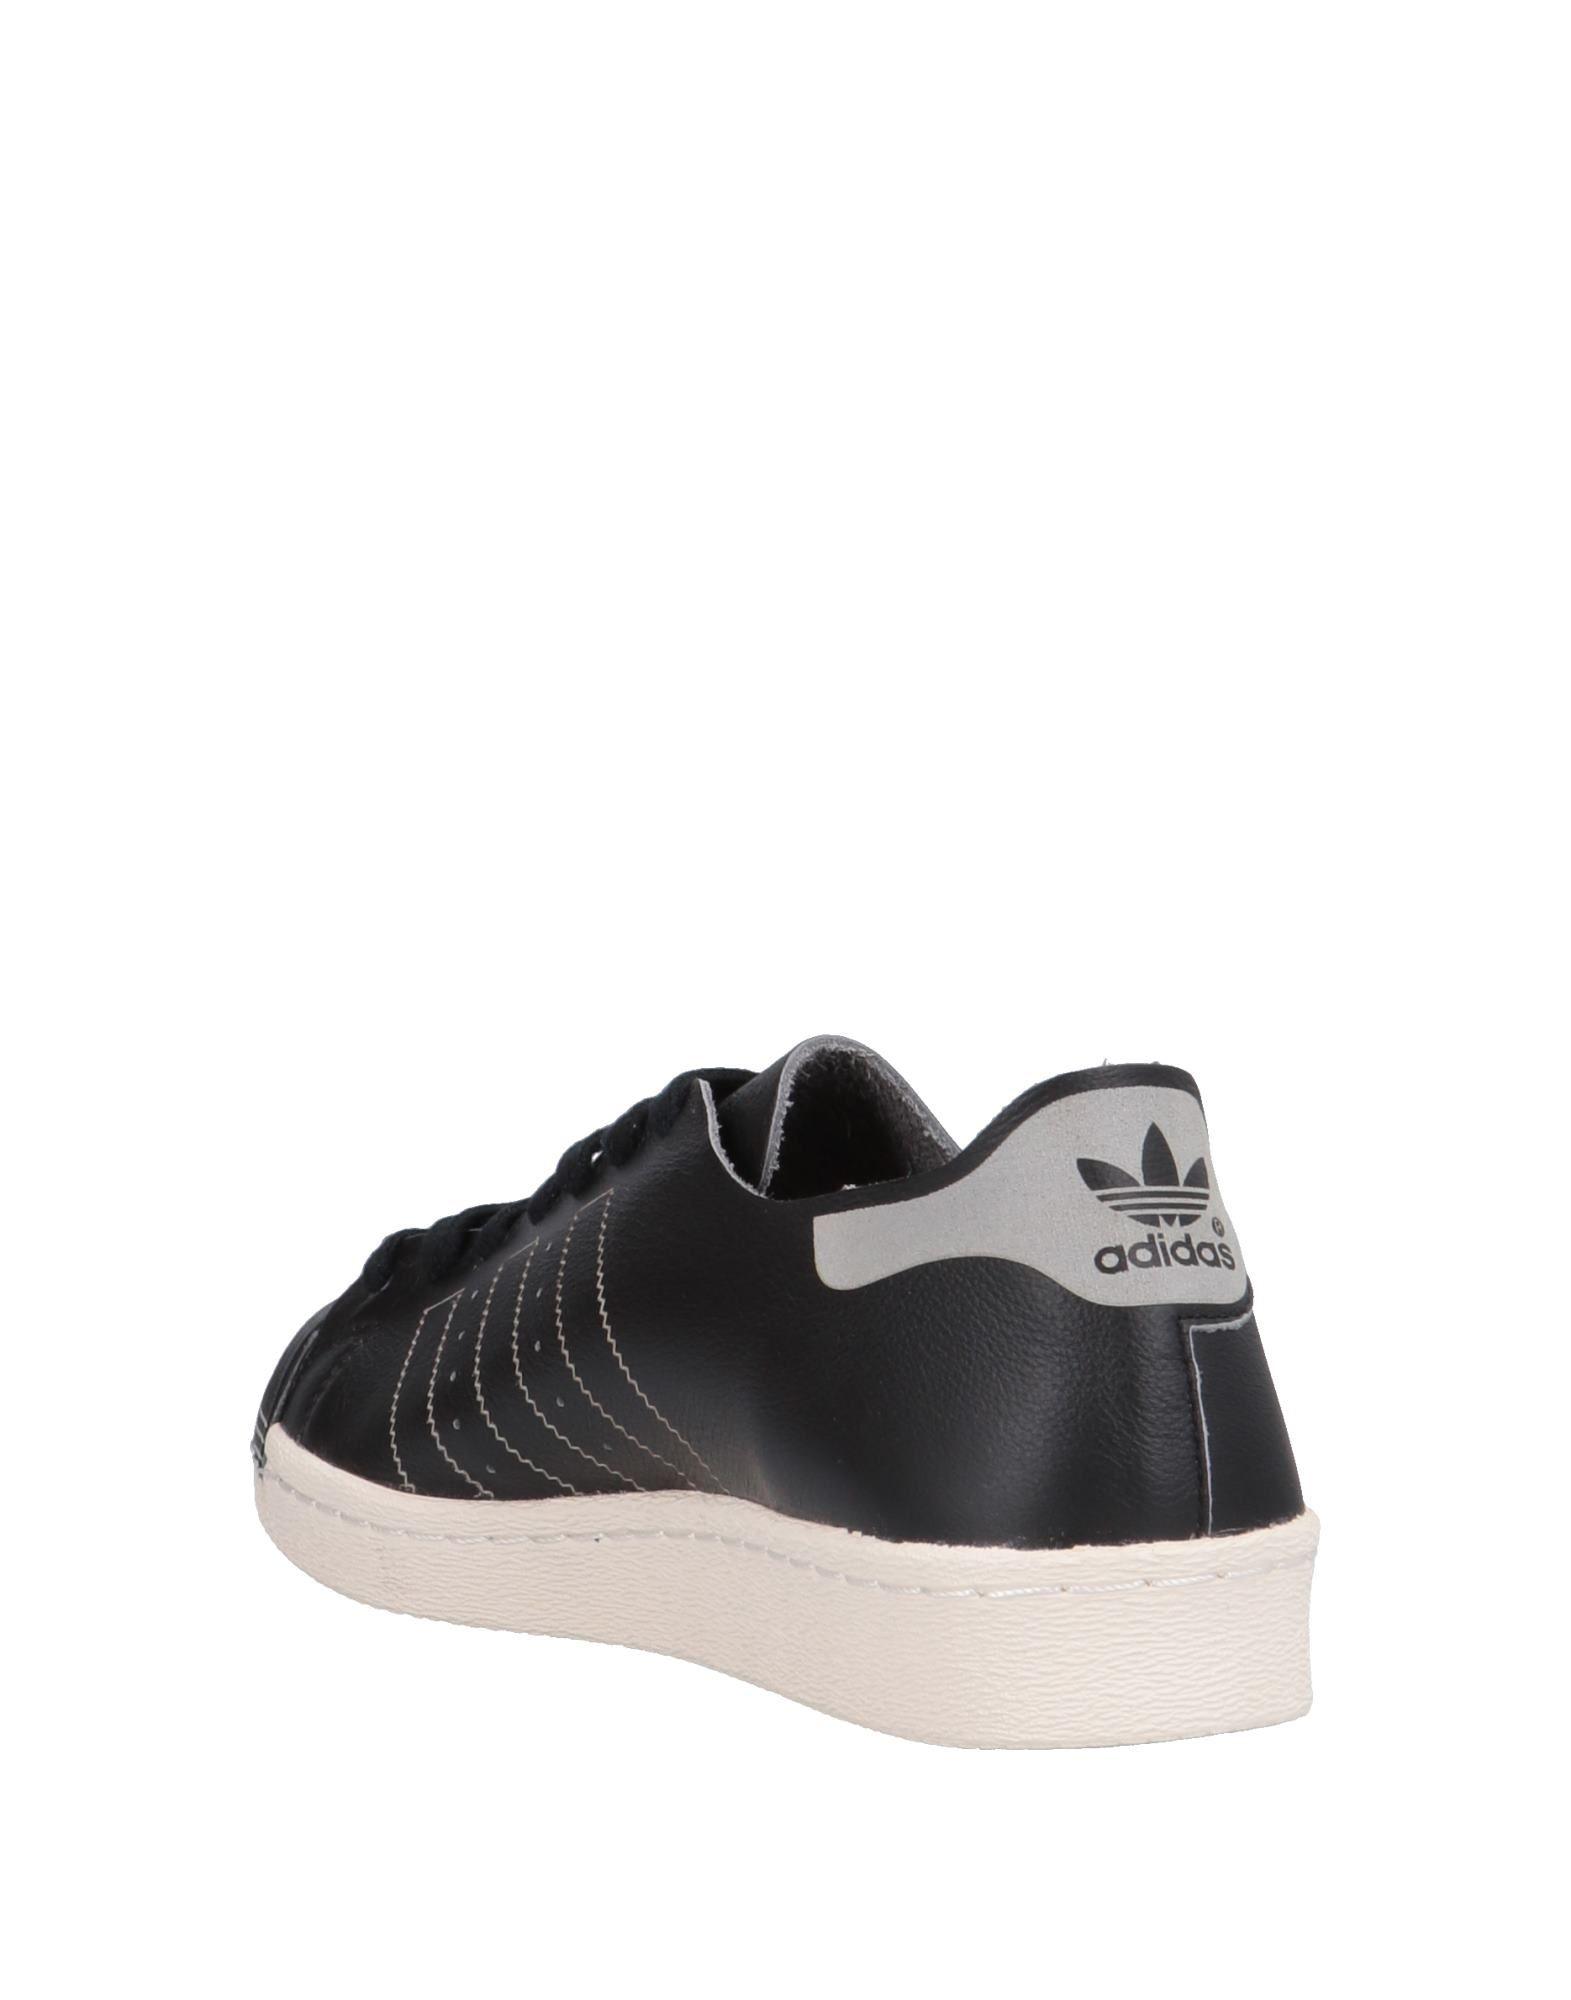 Rabatt echte Schuhe  Adidas Originals Sneakers Herren  Schuhe 11562137XS 5eb483